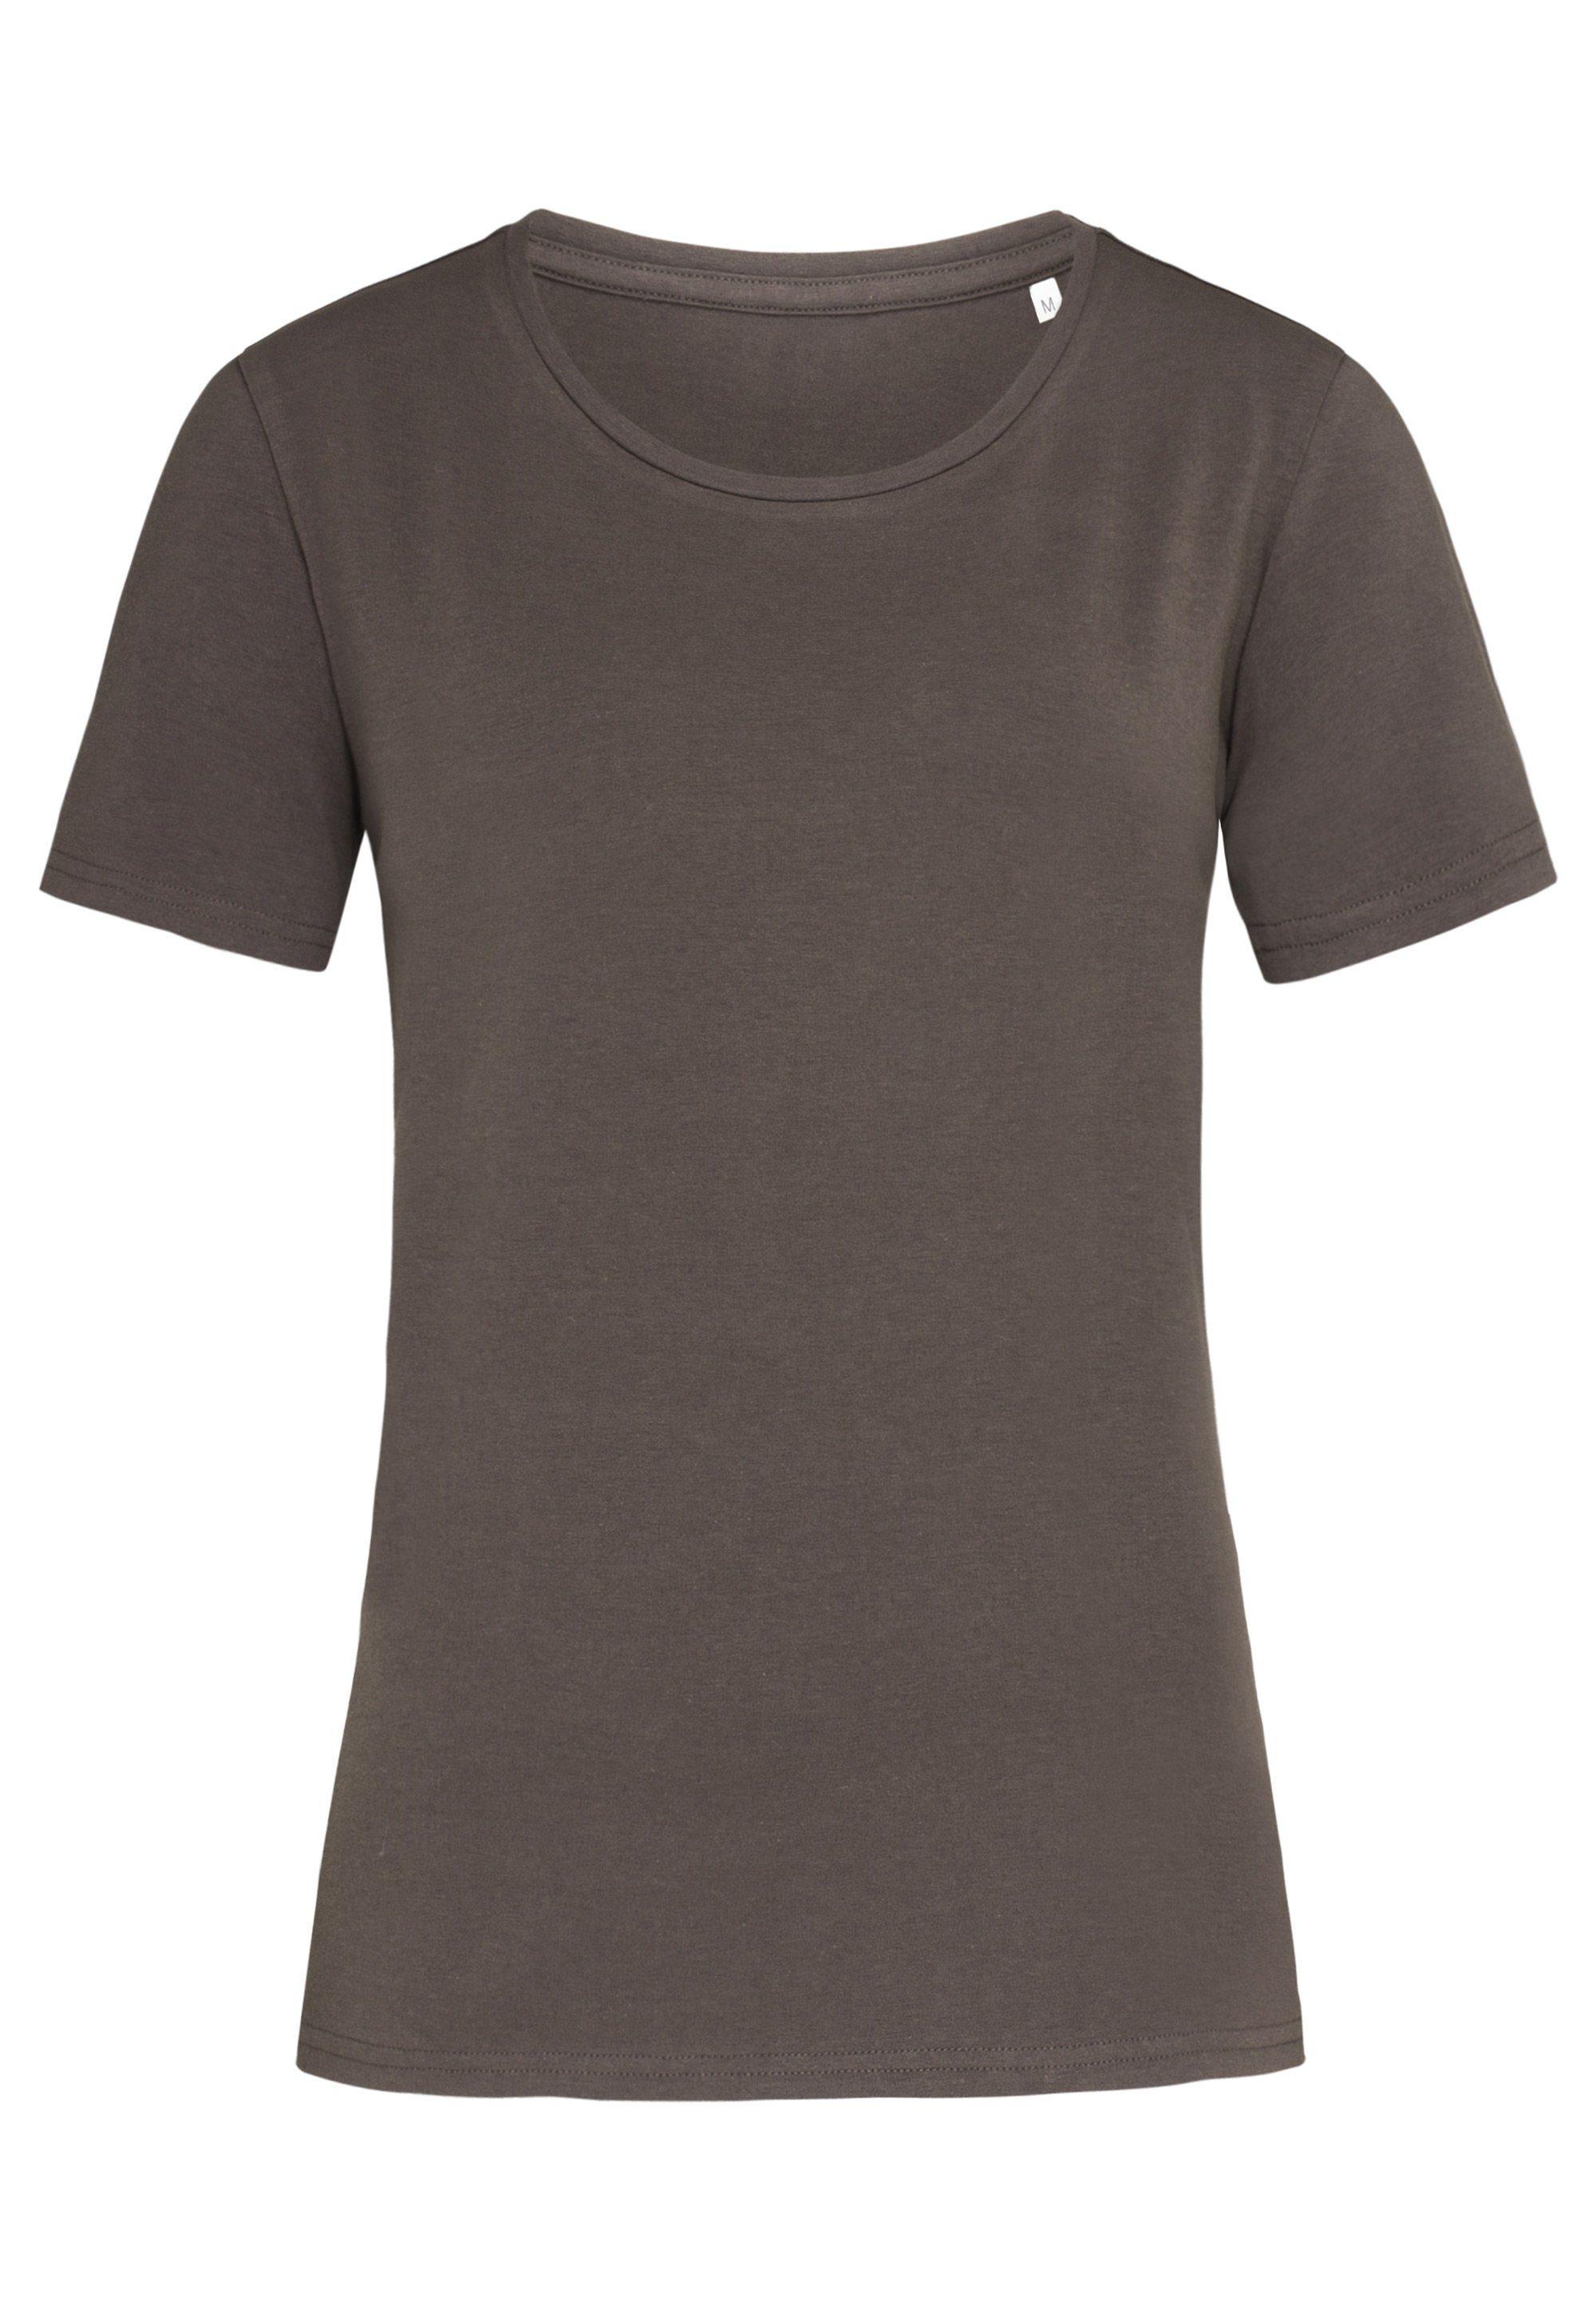 Stedman T-Shirt mit extra weichem Finish